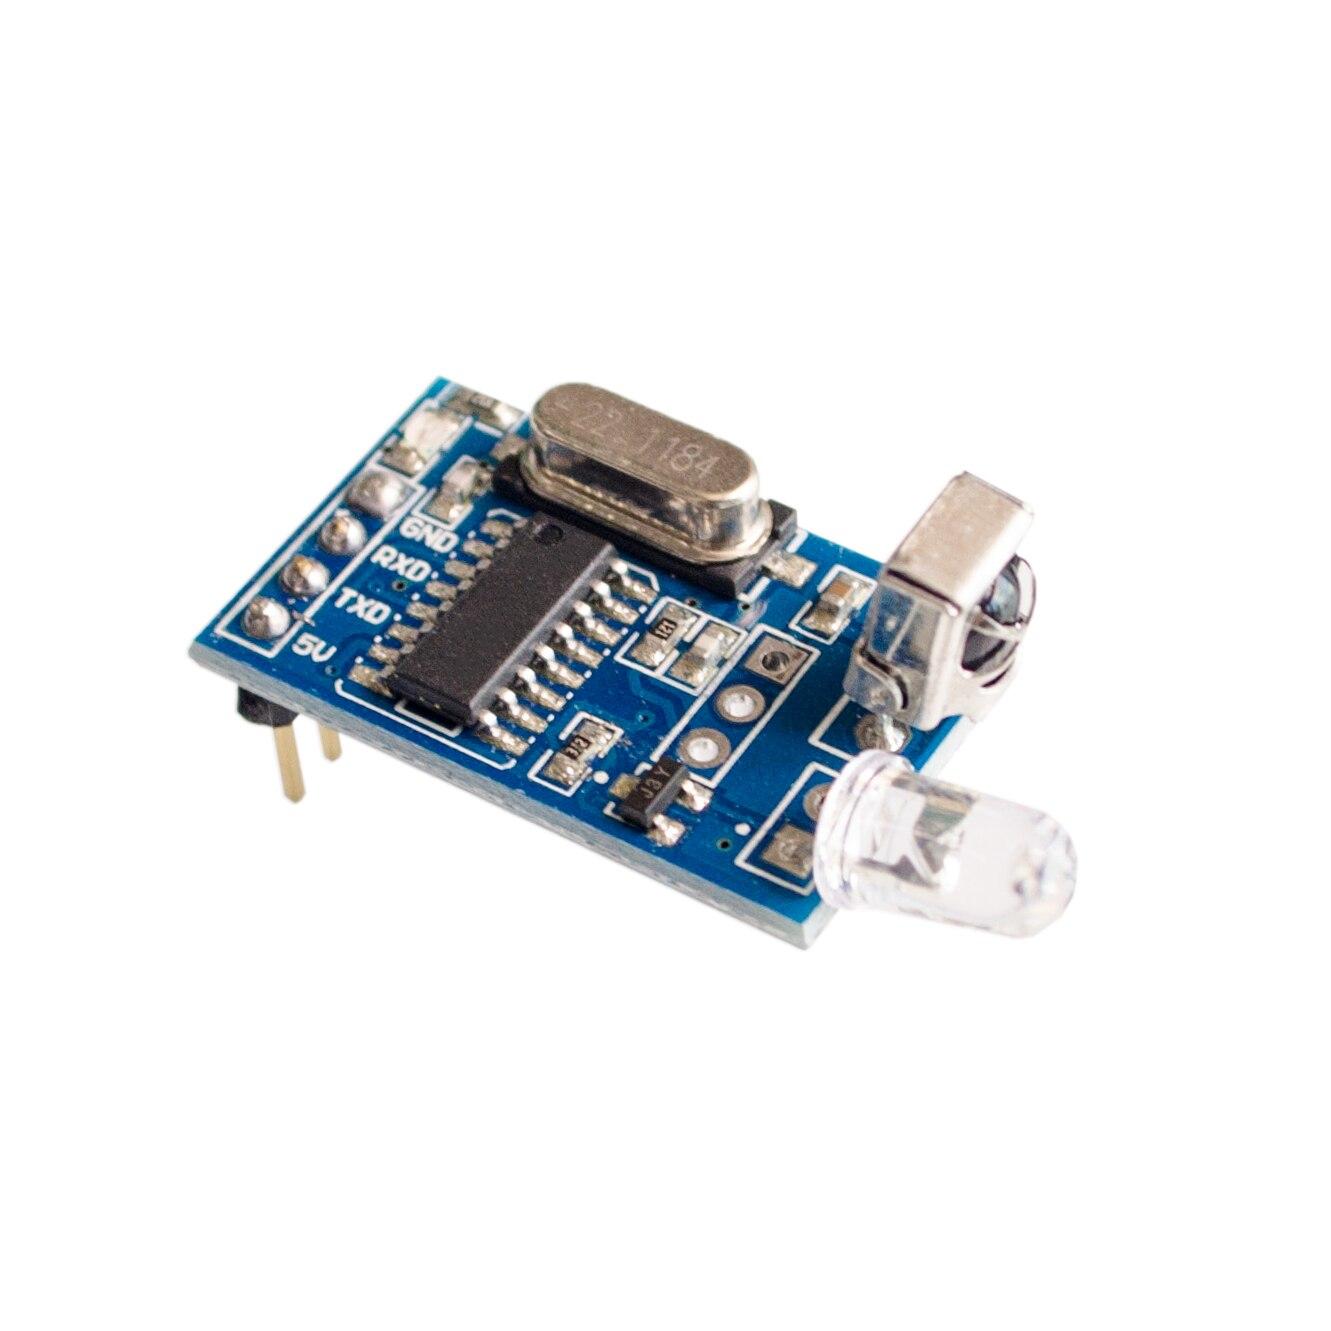 1set Infrared Remote Control Module Wireless Ir Receiver Diy Infra Red Controlled Motor Circuit Homemade 5v Decoder Encoding Transmitterreceiver